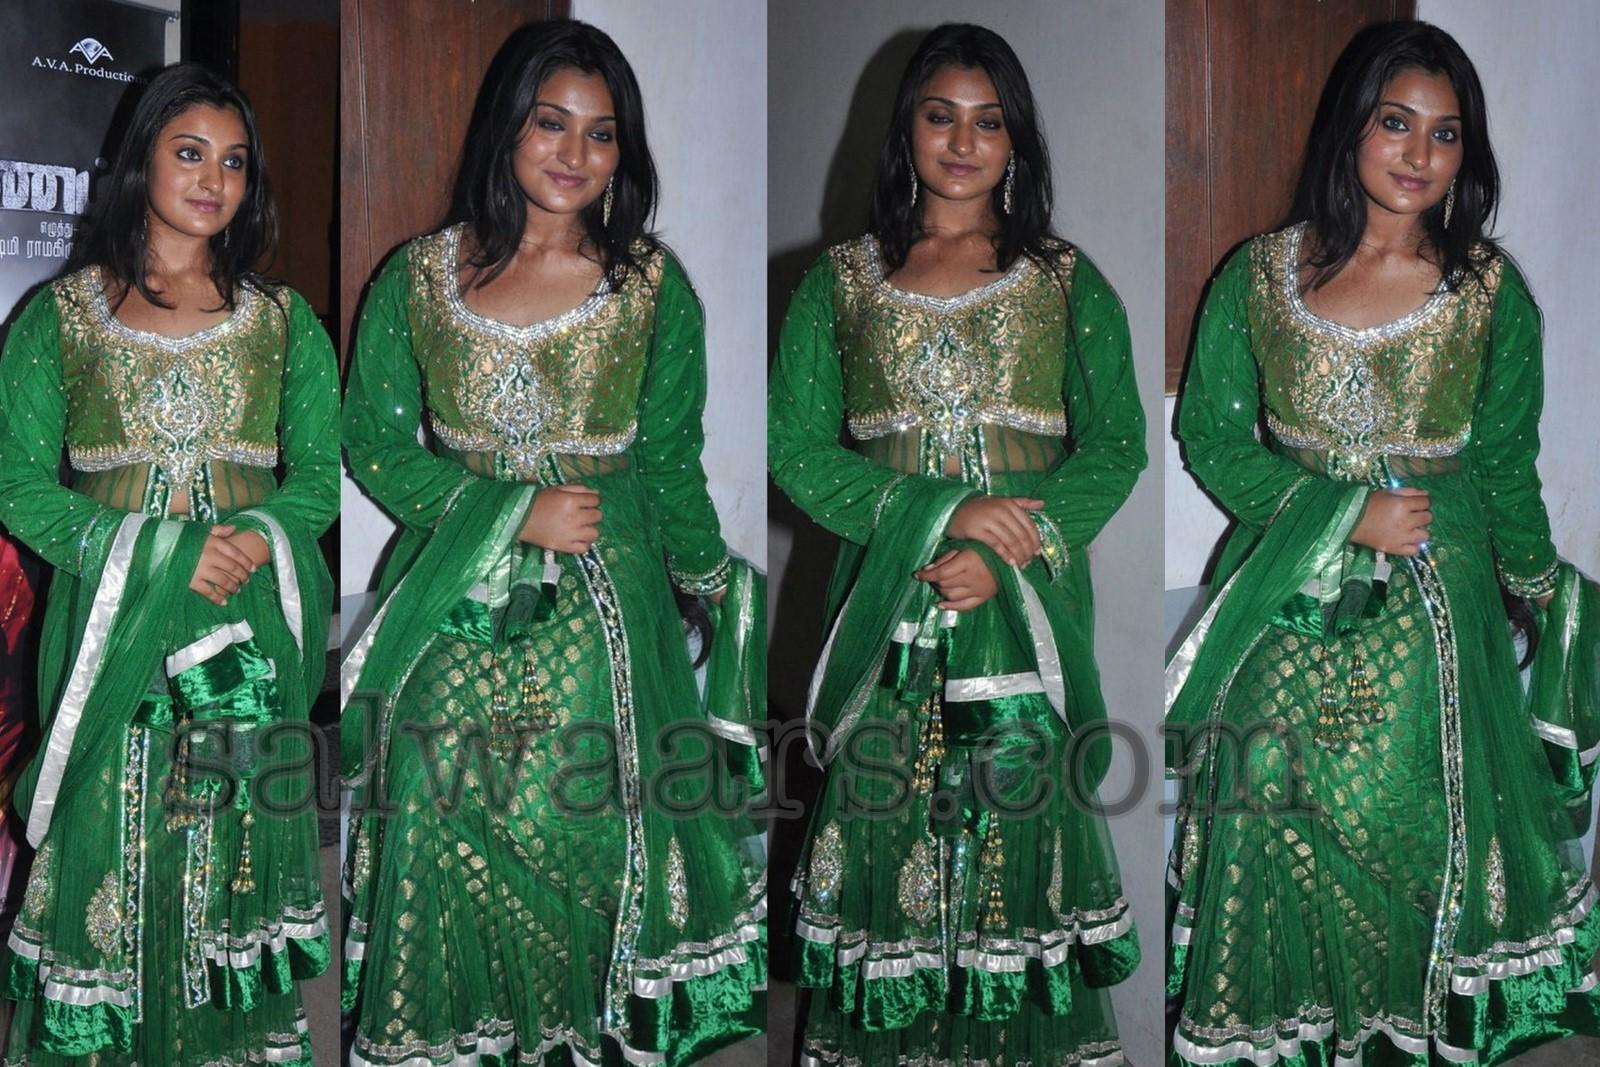 http://3.bp.blogspot.com/-iZH0e7C8nNU/T-IixcNt3QI/AAAAAAAAs1Y/aq7rmJ6pkbo/s1600/Green_Banaras_Long_Dress.jpg